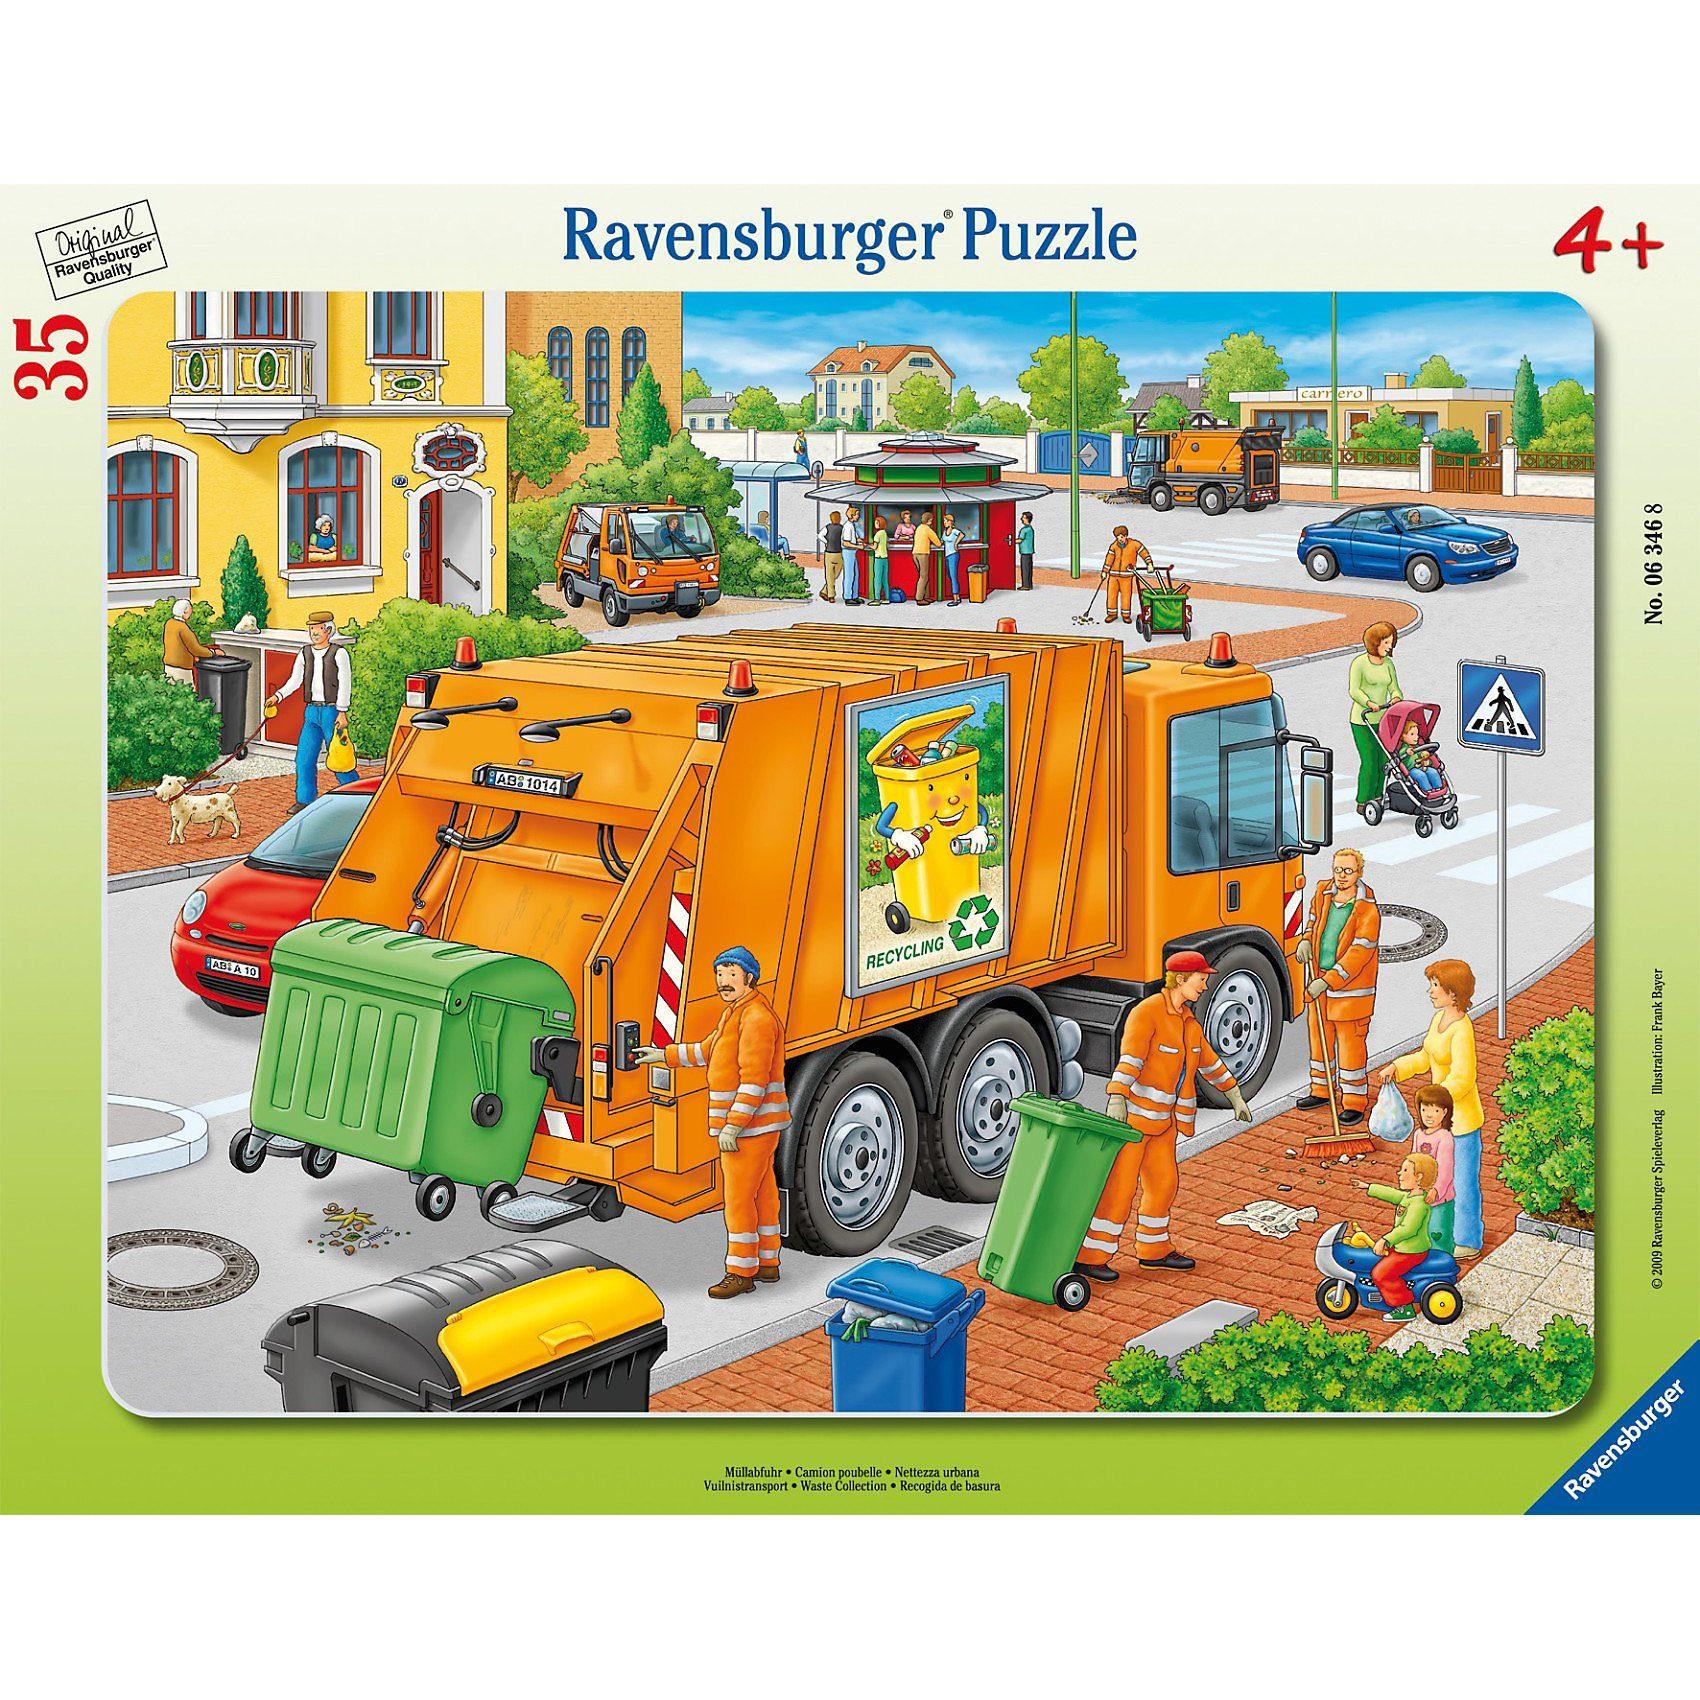 Ravensburger Rahmenpuzzle 35 Teile Müllabfuhr